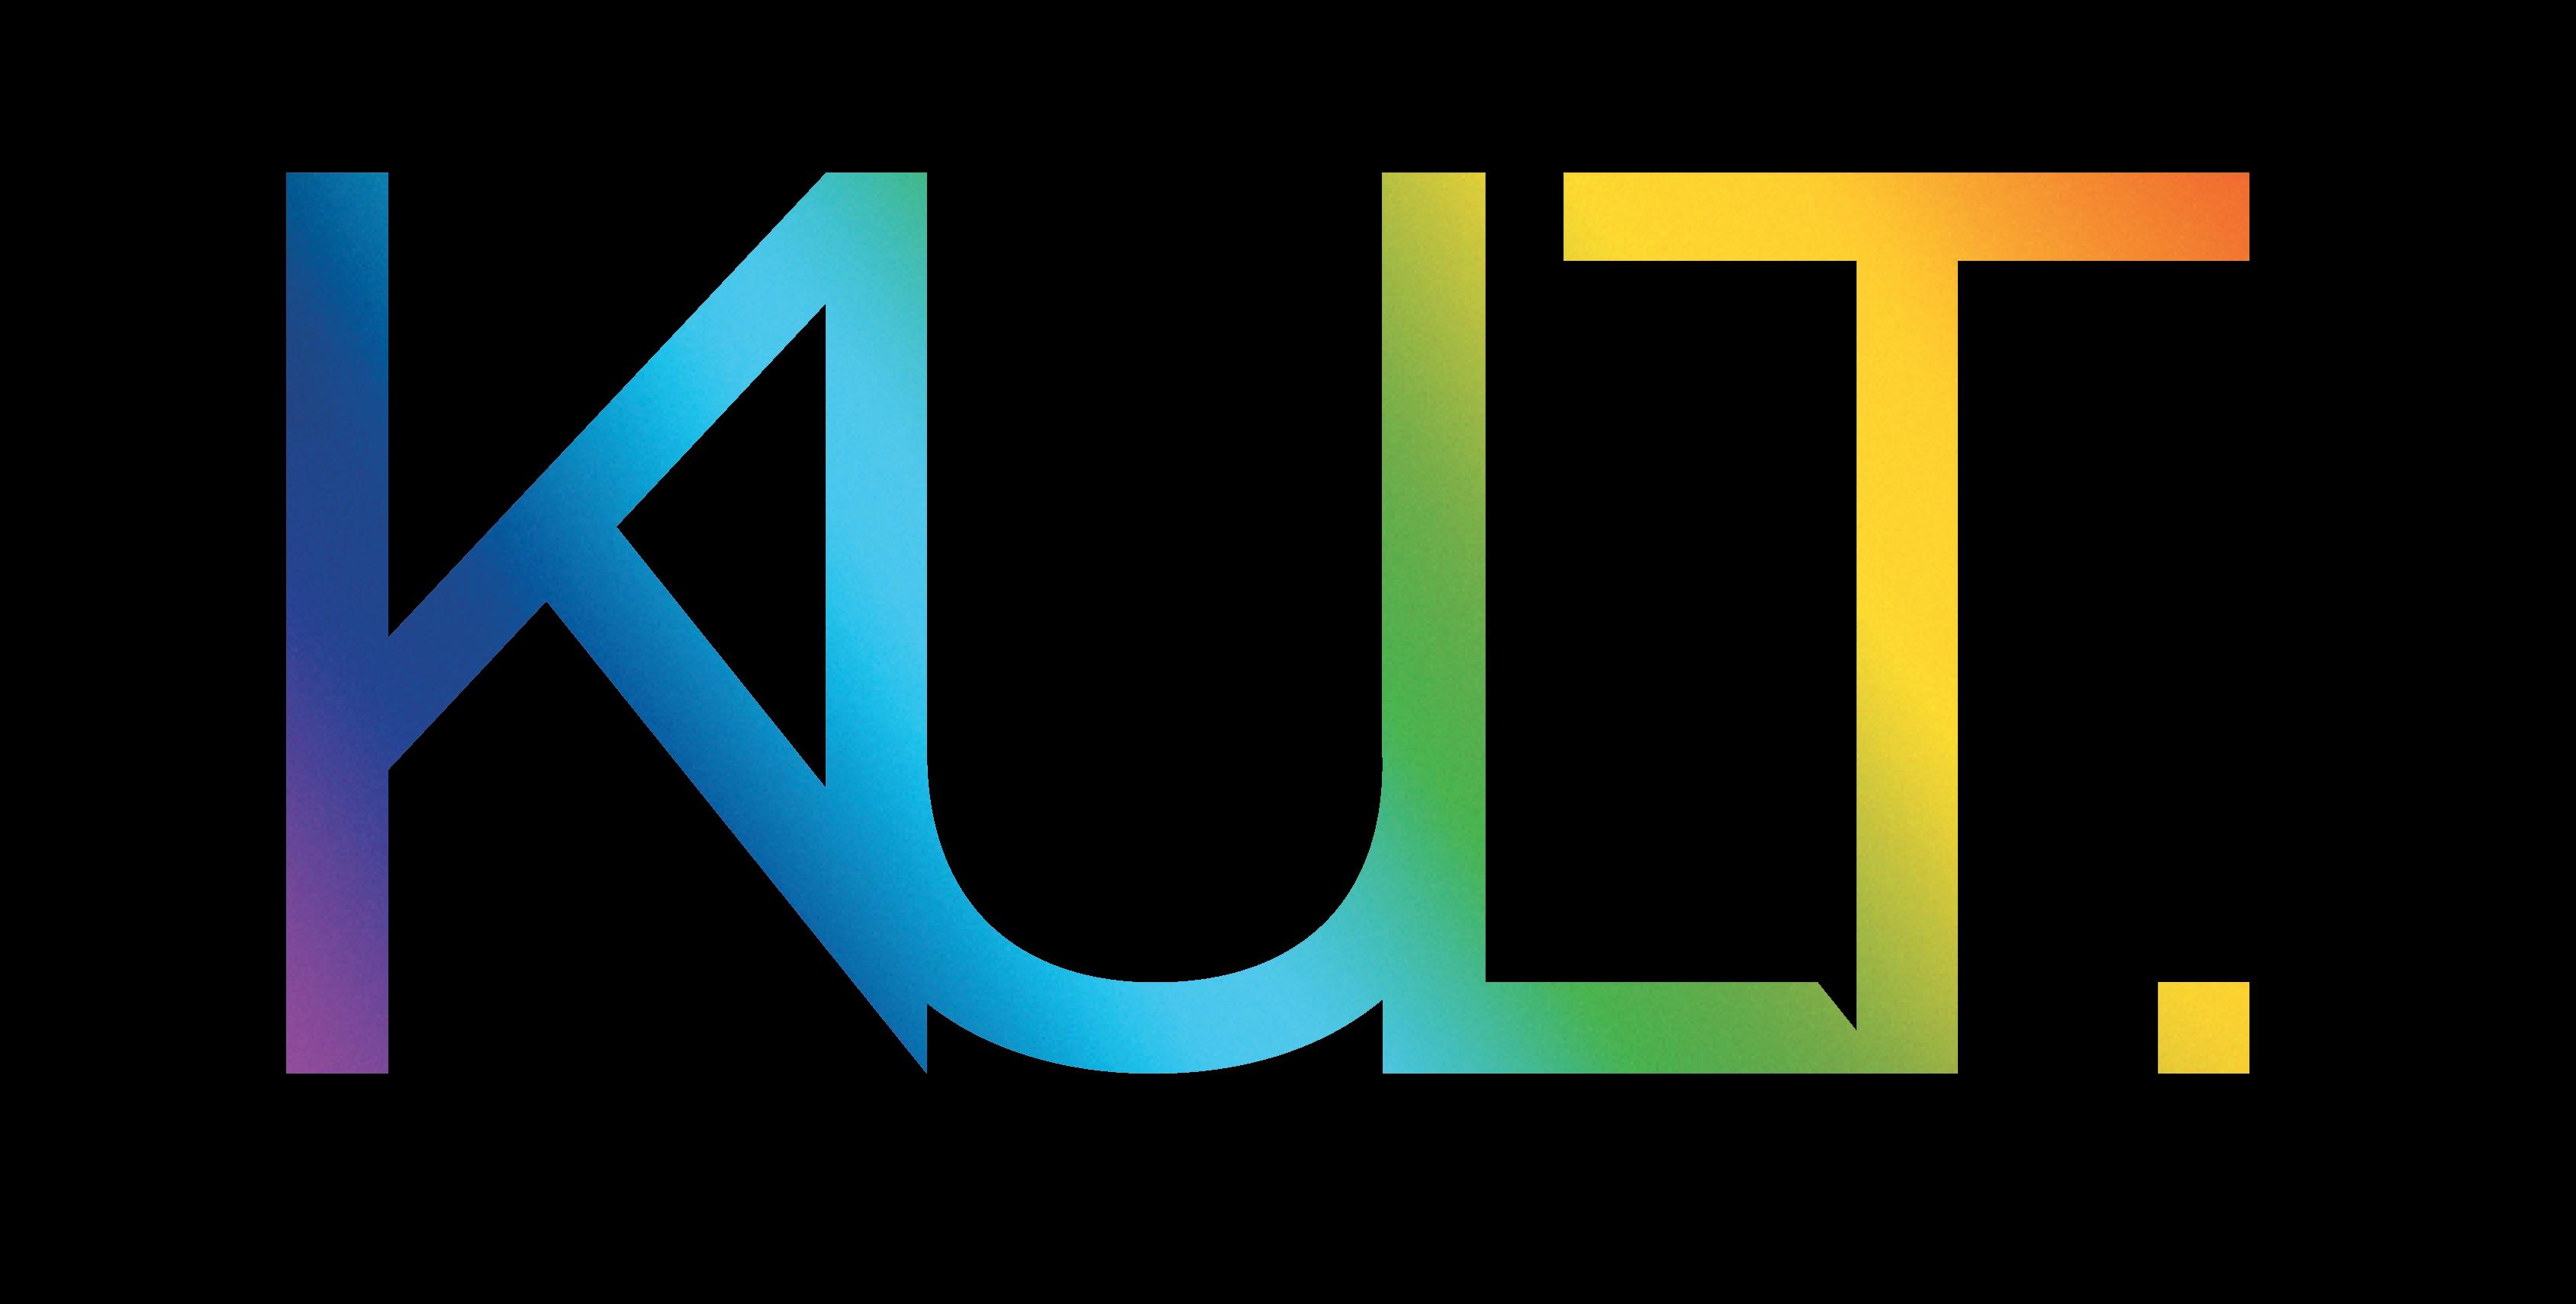 Magazine KULT